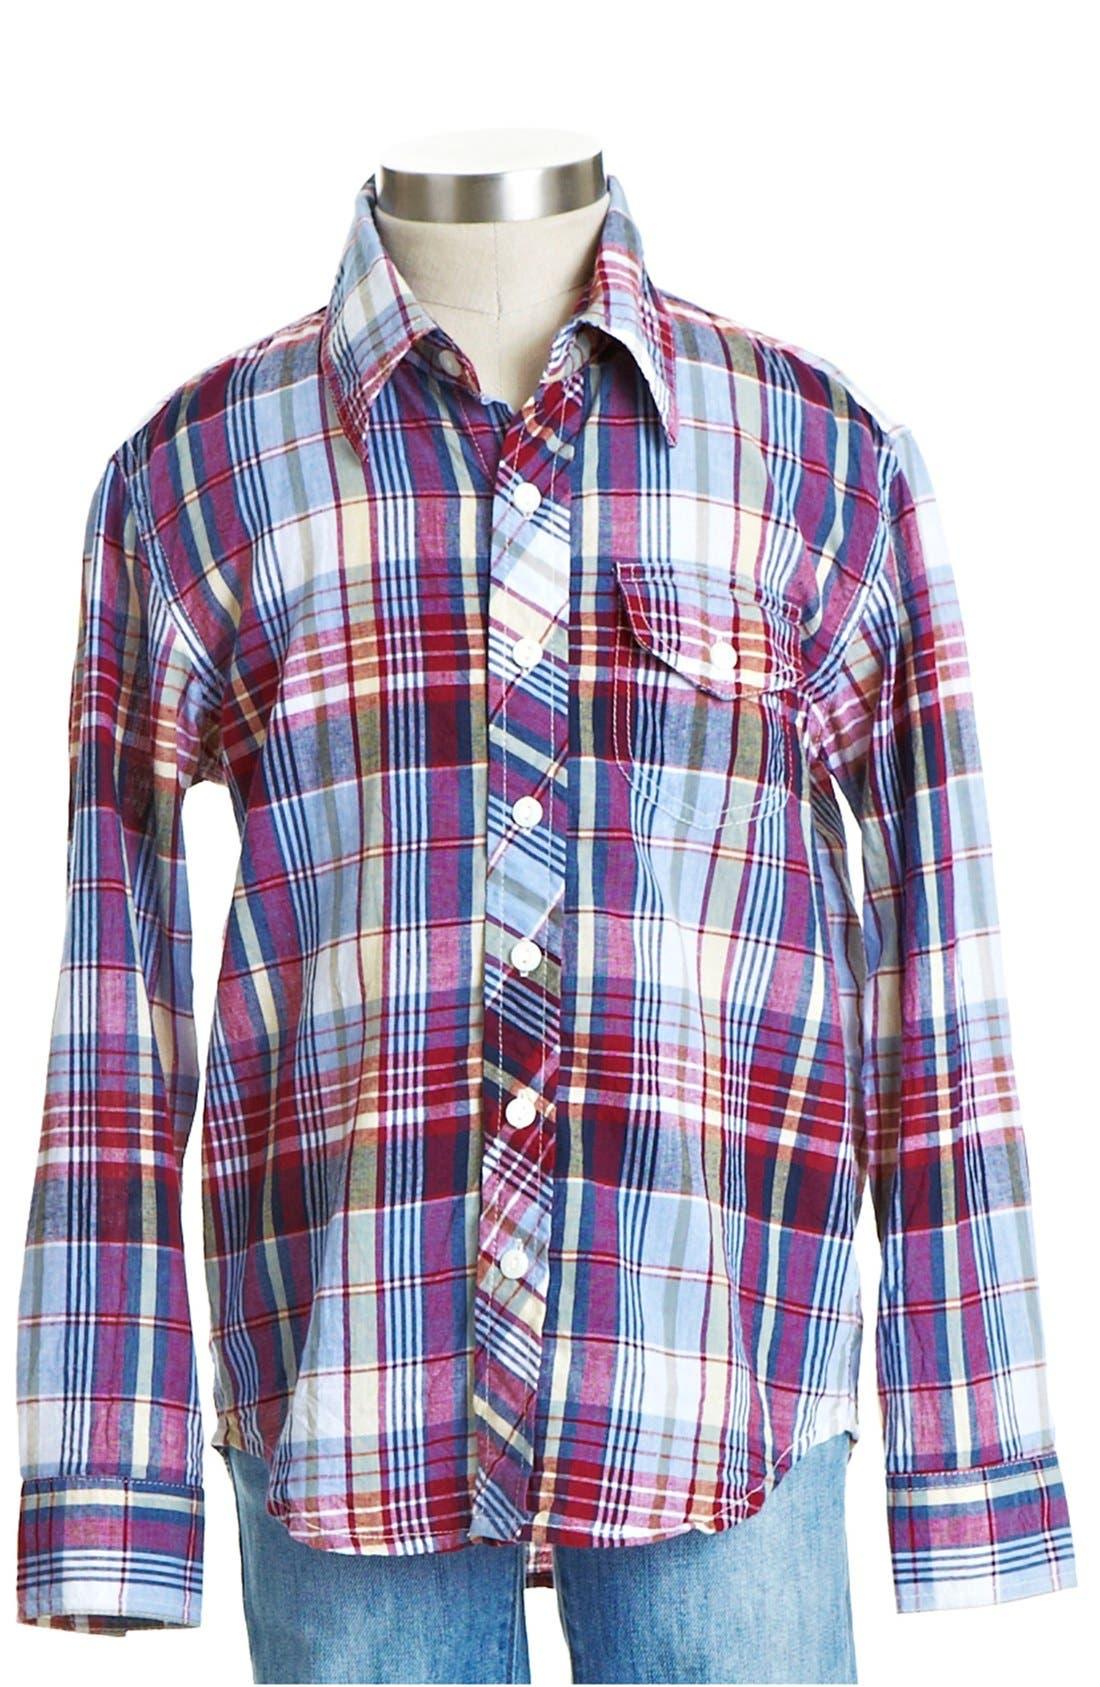 Alternate Image 1 Selected - Peek 'Brunswick' Plaid Shirt (Toddler Boys, Little Boys & Big Boys)